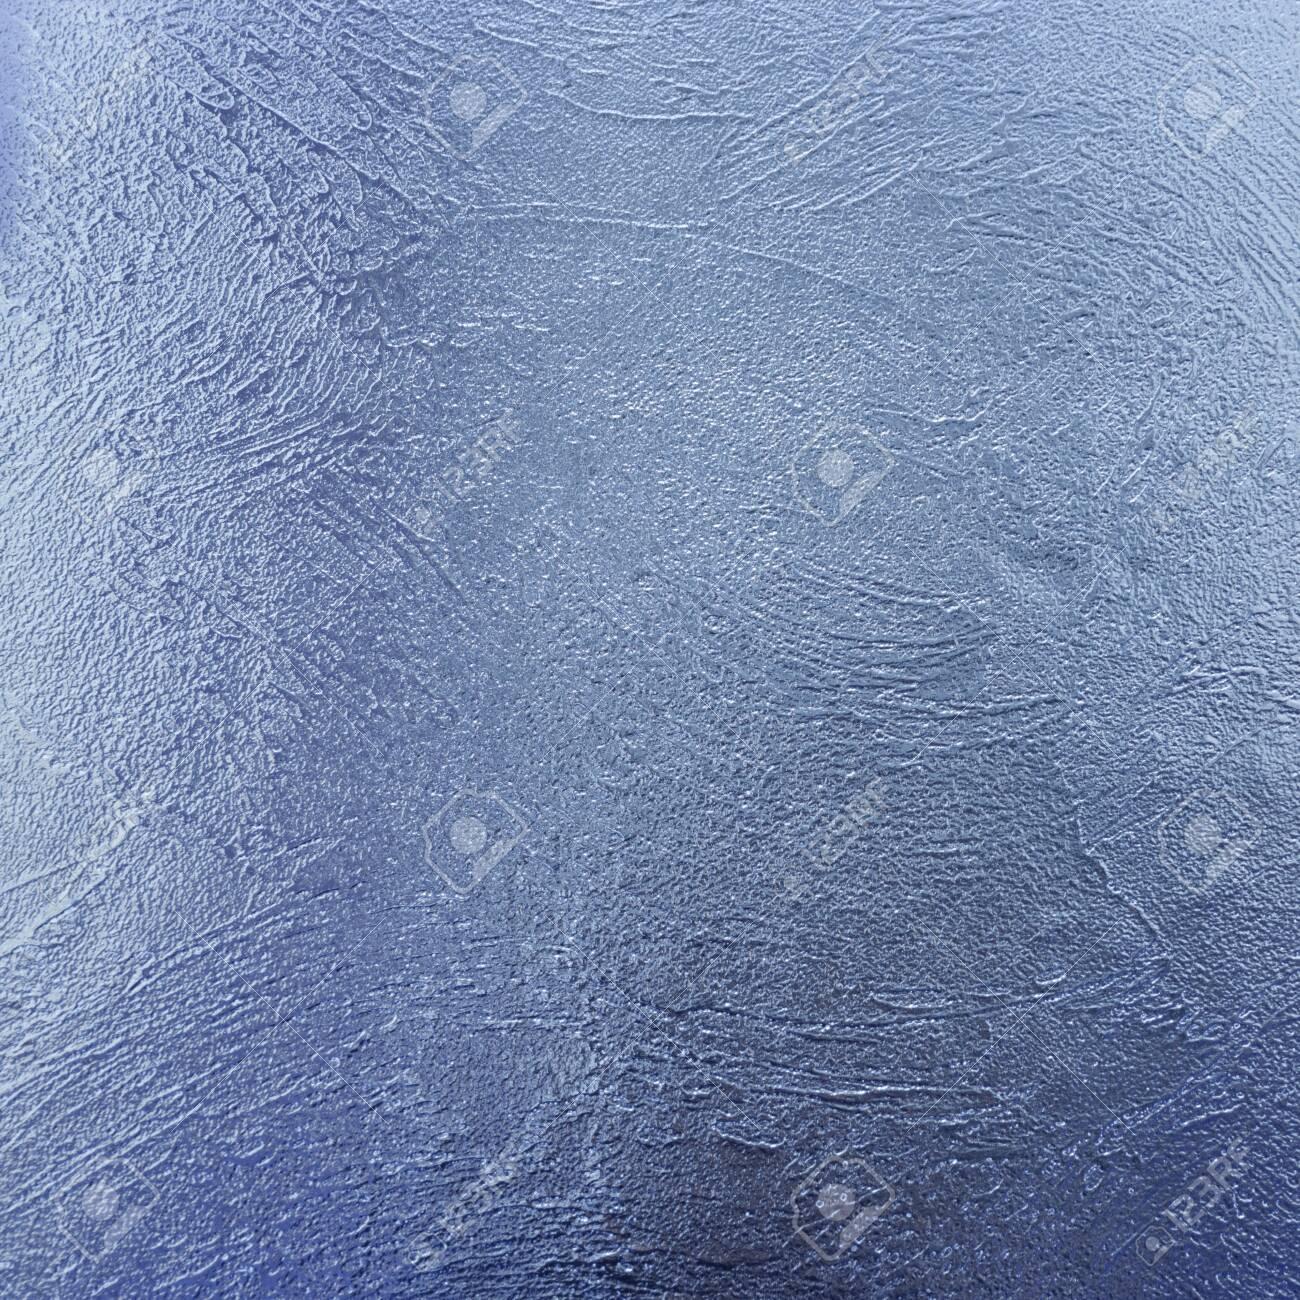 Ice surface background - 129195595